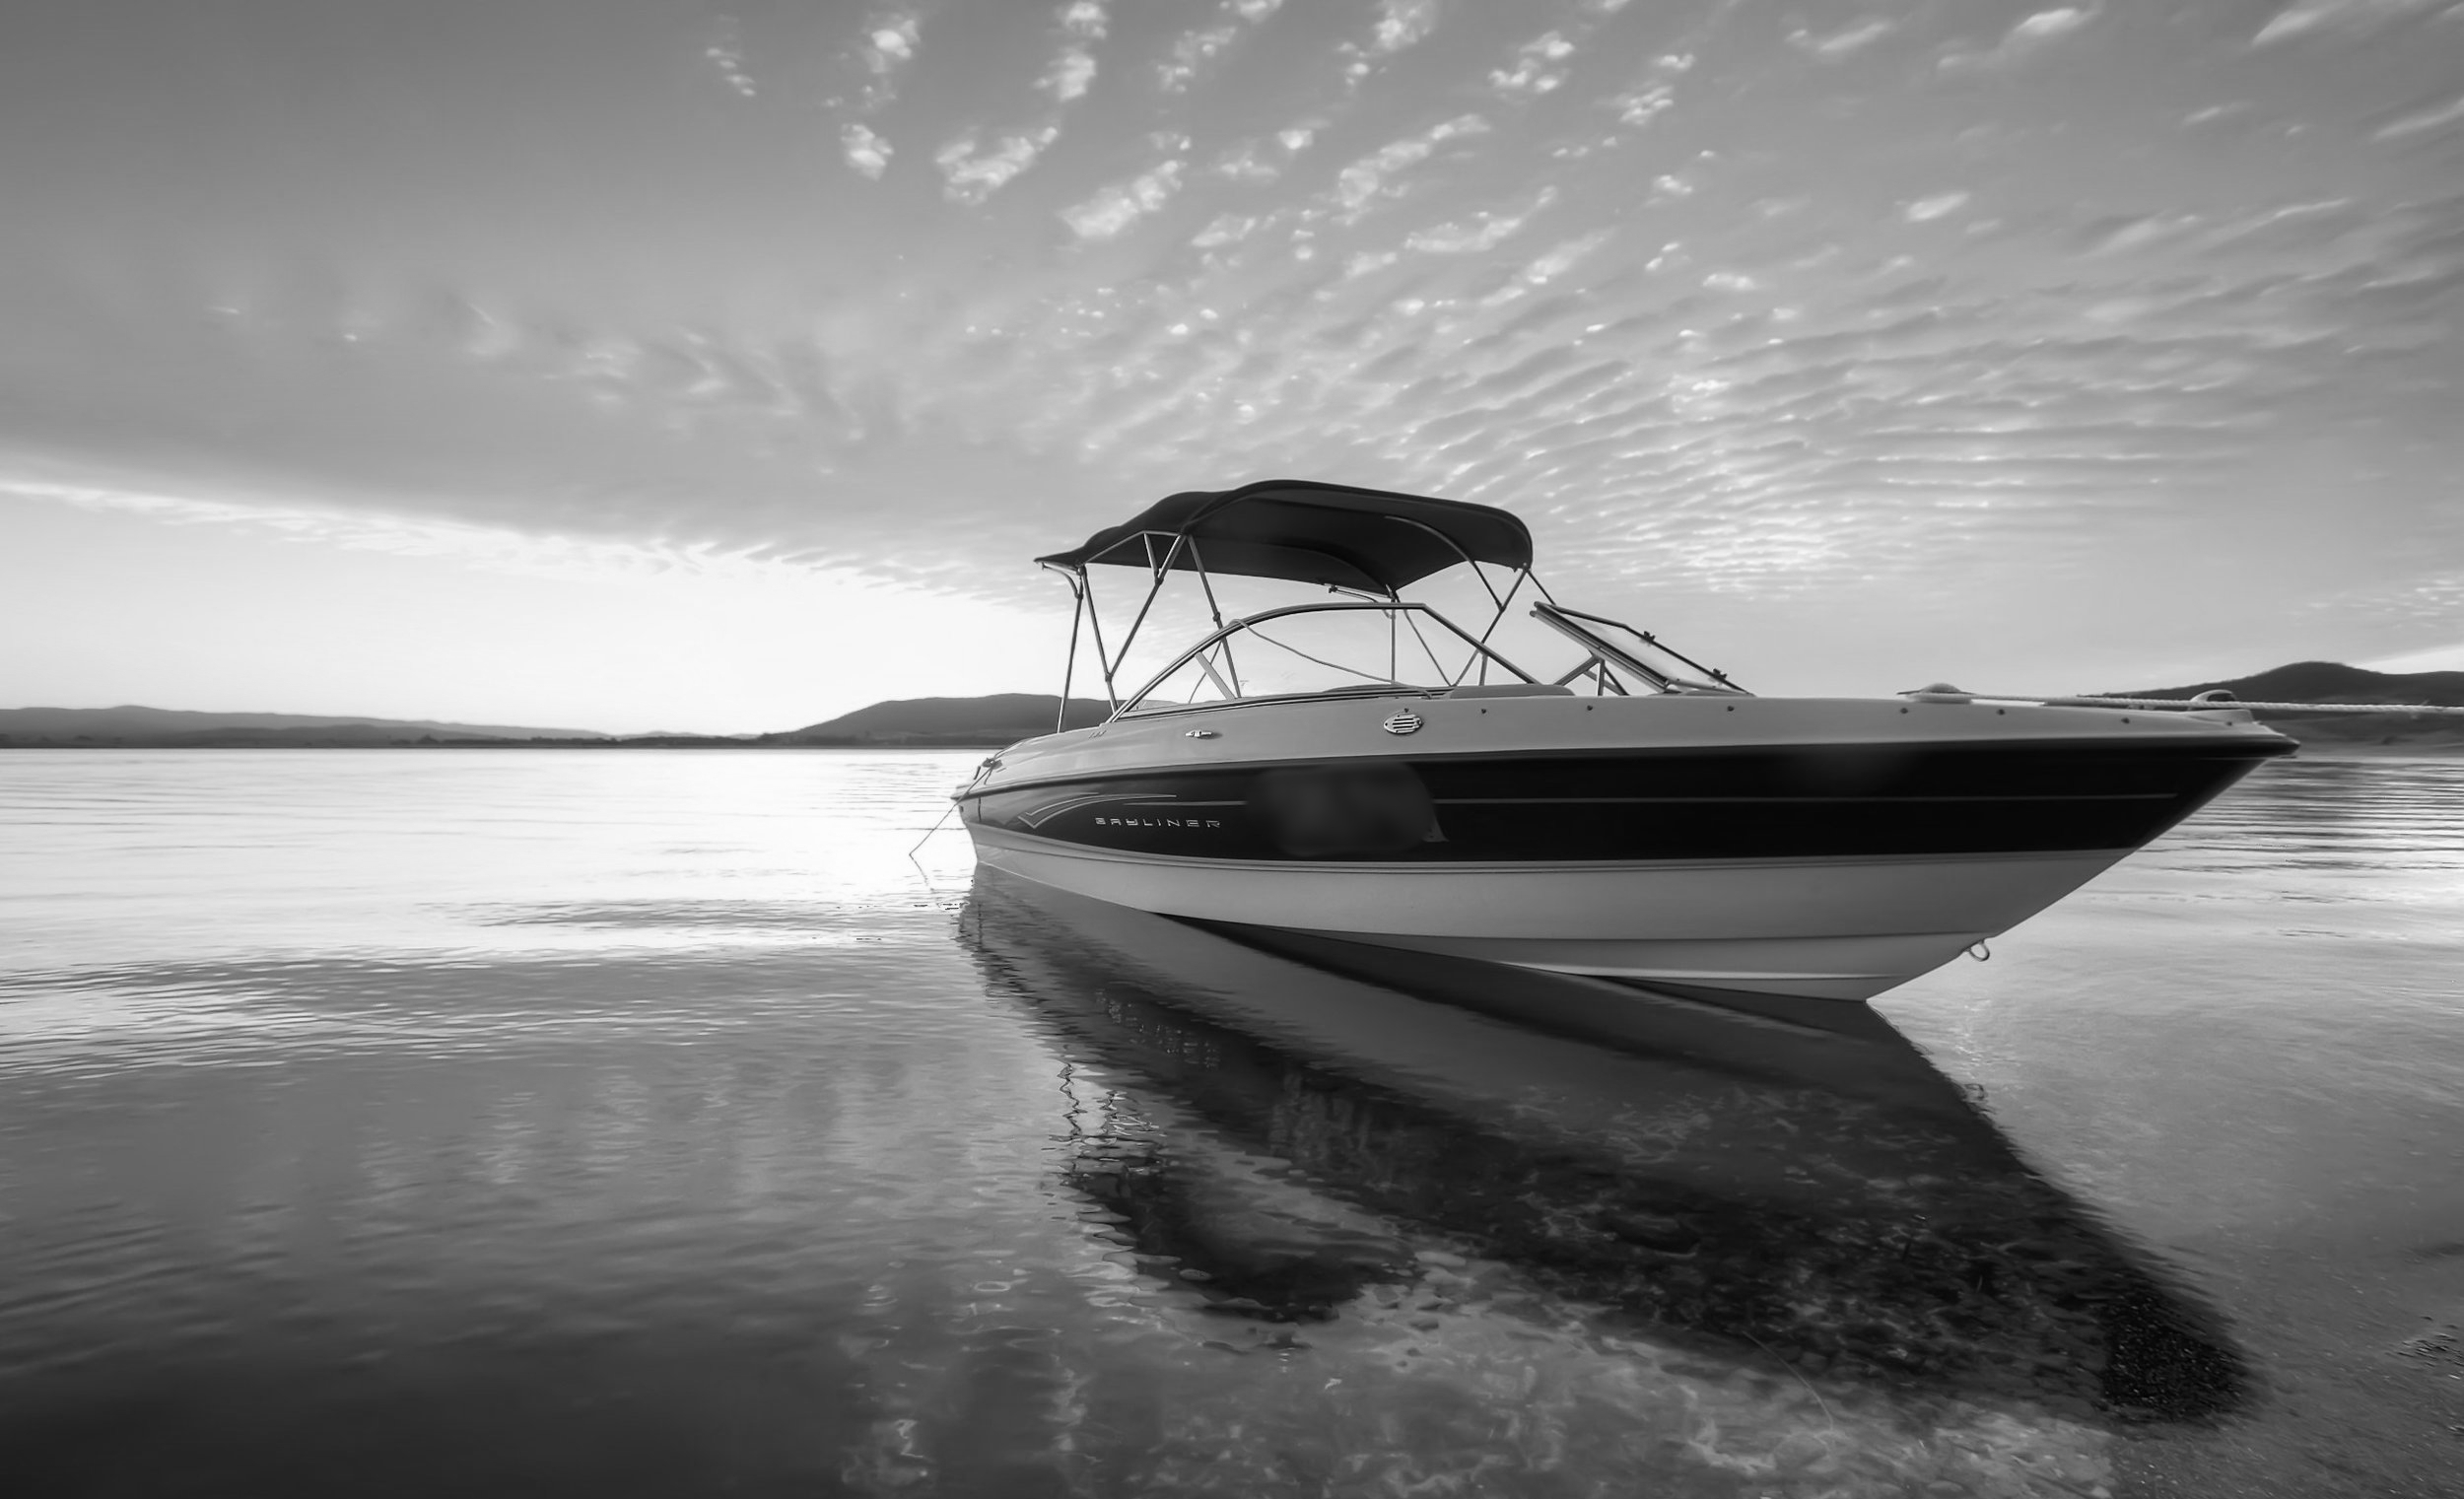 Jet boat جت بوت